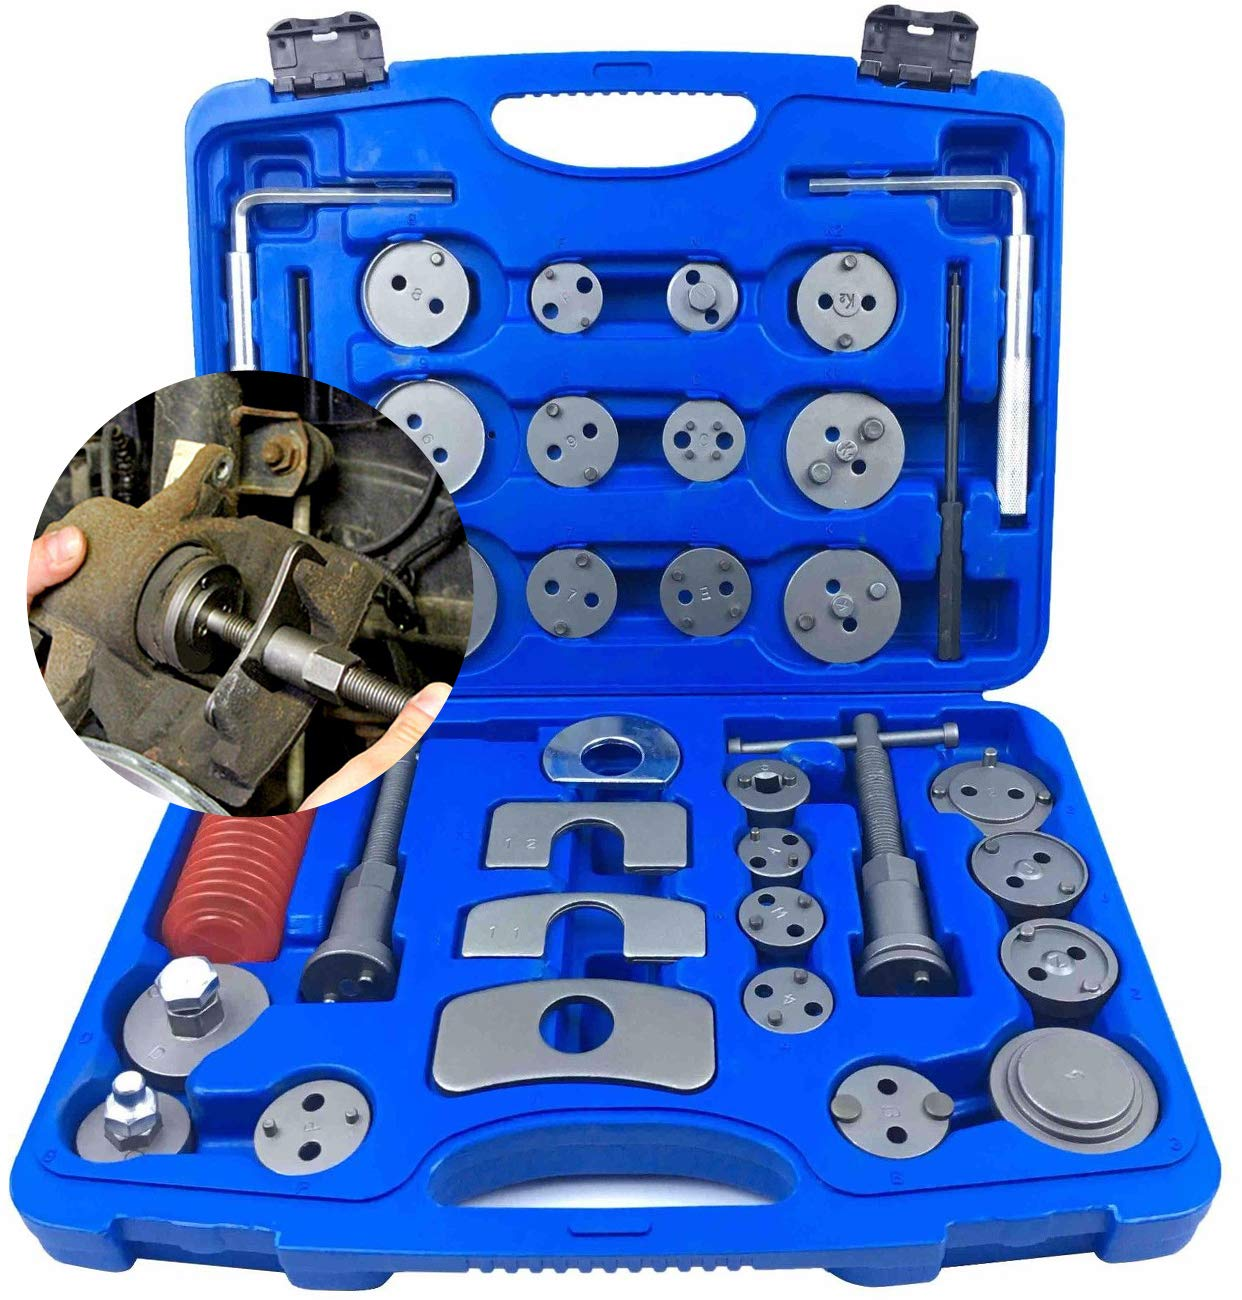 Brake Disc Caliper Wind Back Tool Kit - 35 Piece Universal Piston Rewind Set - Discs Break Pad Caliper Compressor Service Tools -